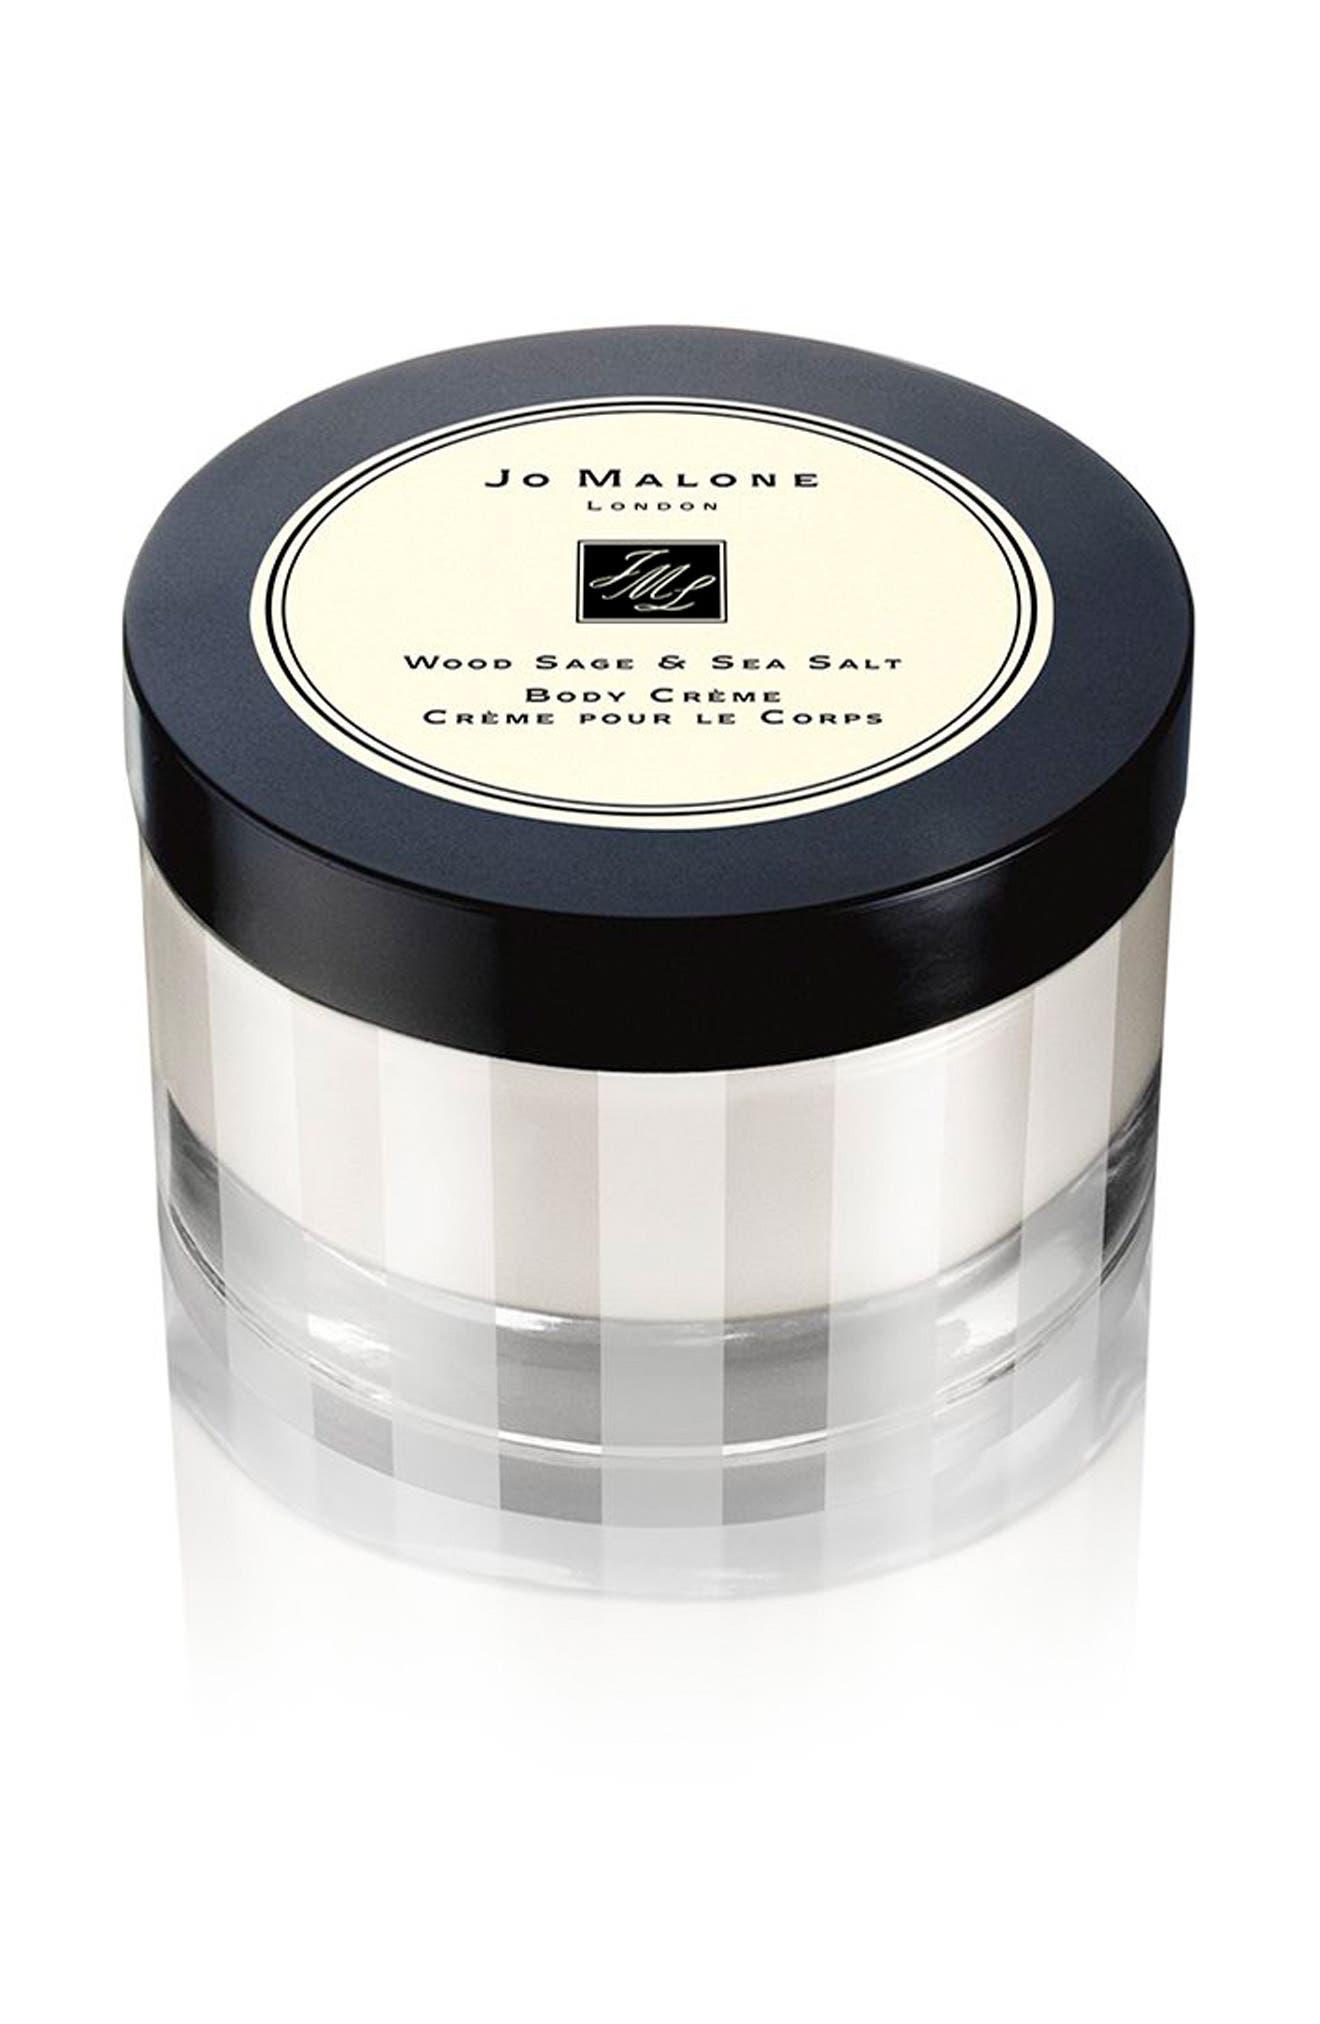 Main Image - Jo Malone London™ Wood Sage & Sea Salt Body Cream